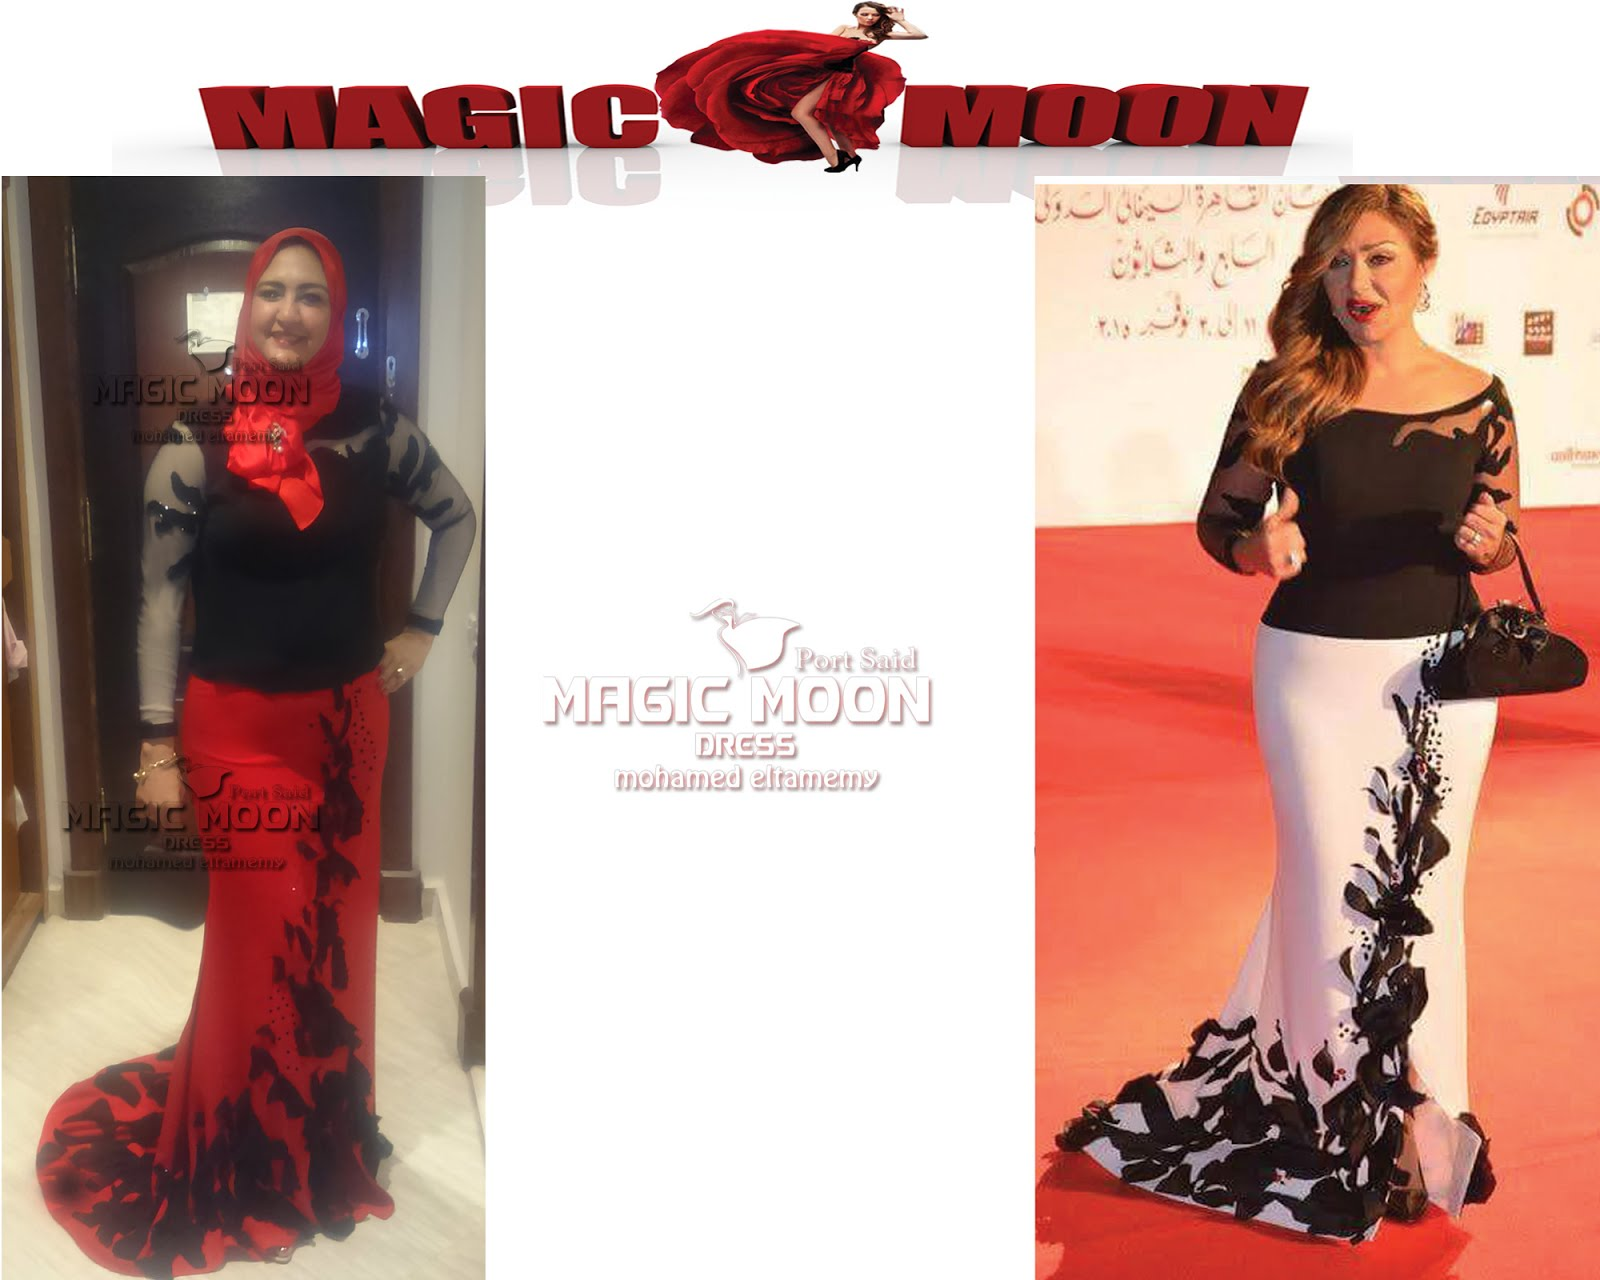 fdc48a463c8aa magic moon.Dresses  فستان اسود في احمر سهرة سوارية ماجيك مون بورسعيد